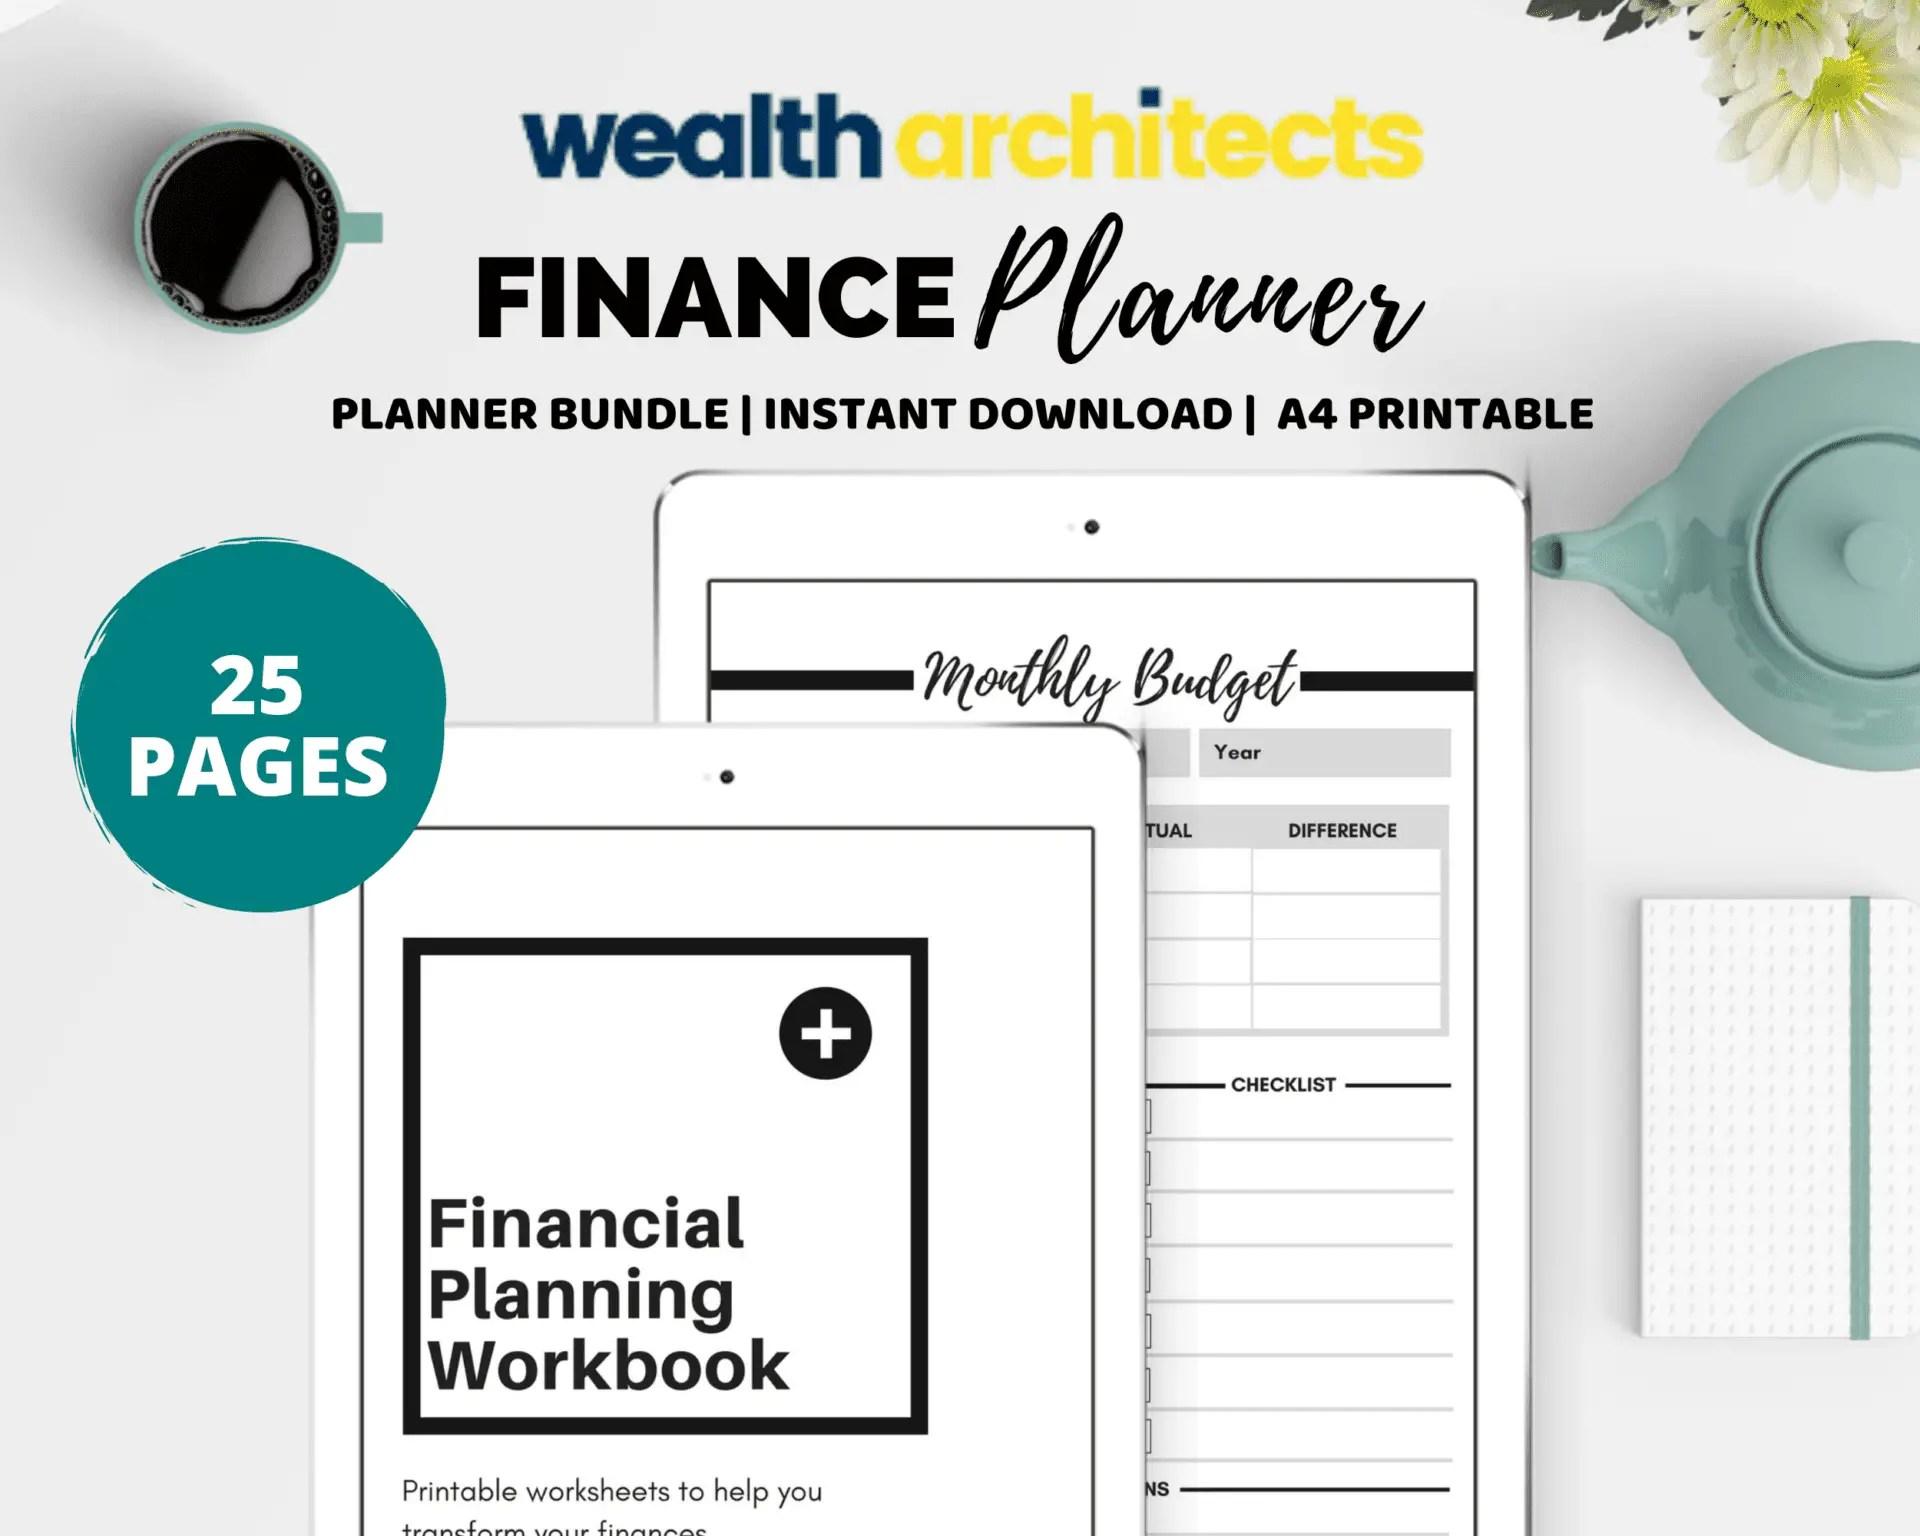 Finance Planner Printable Workbook - Planner Bundle - Wealth Architects